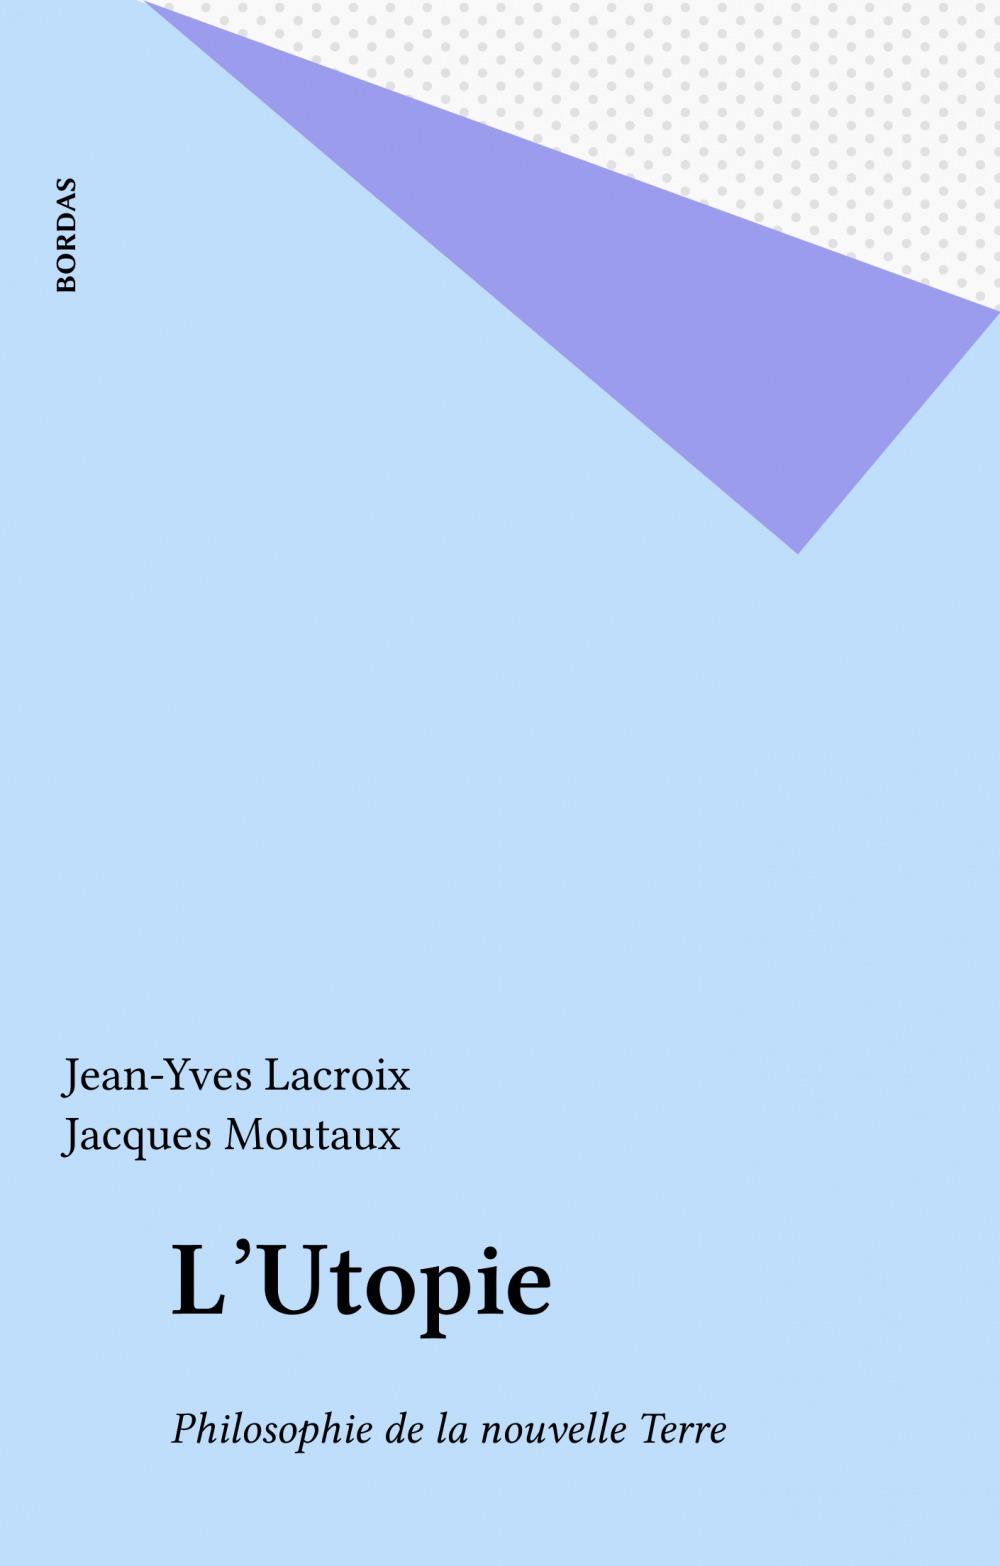 Jean-Yves Lacroix L'Utopie